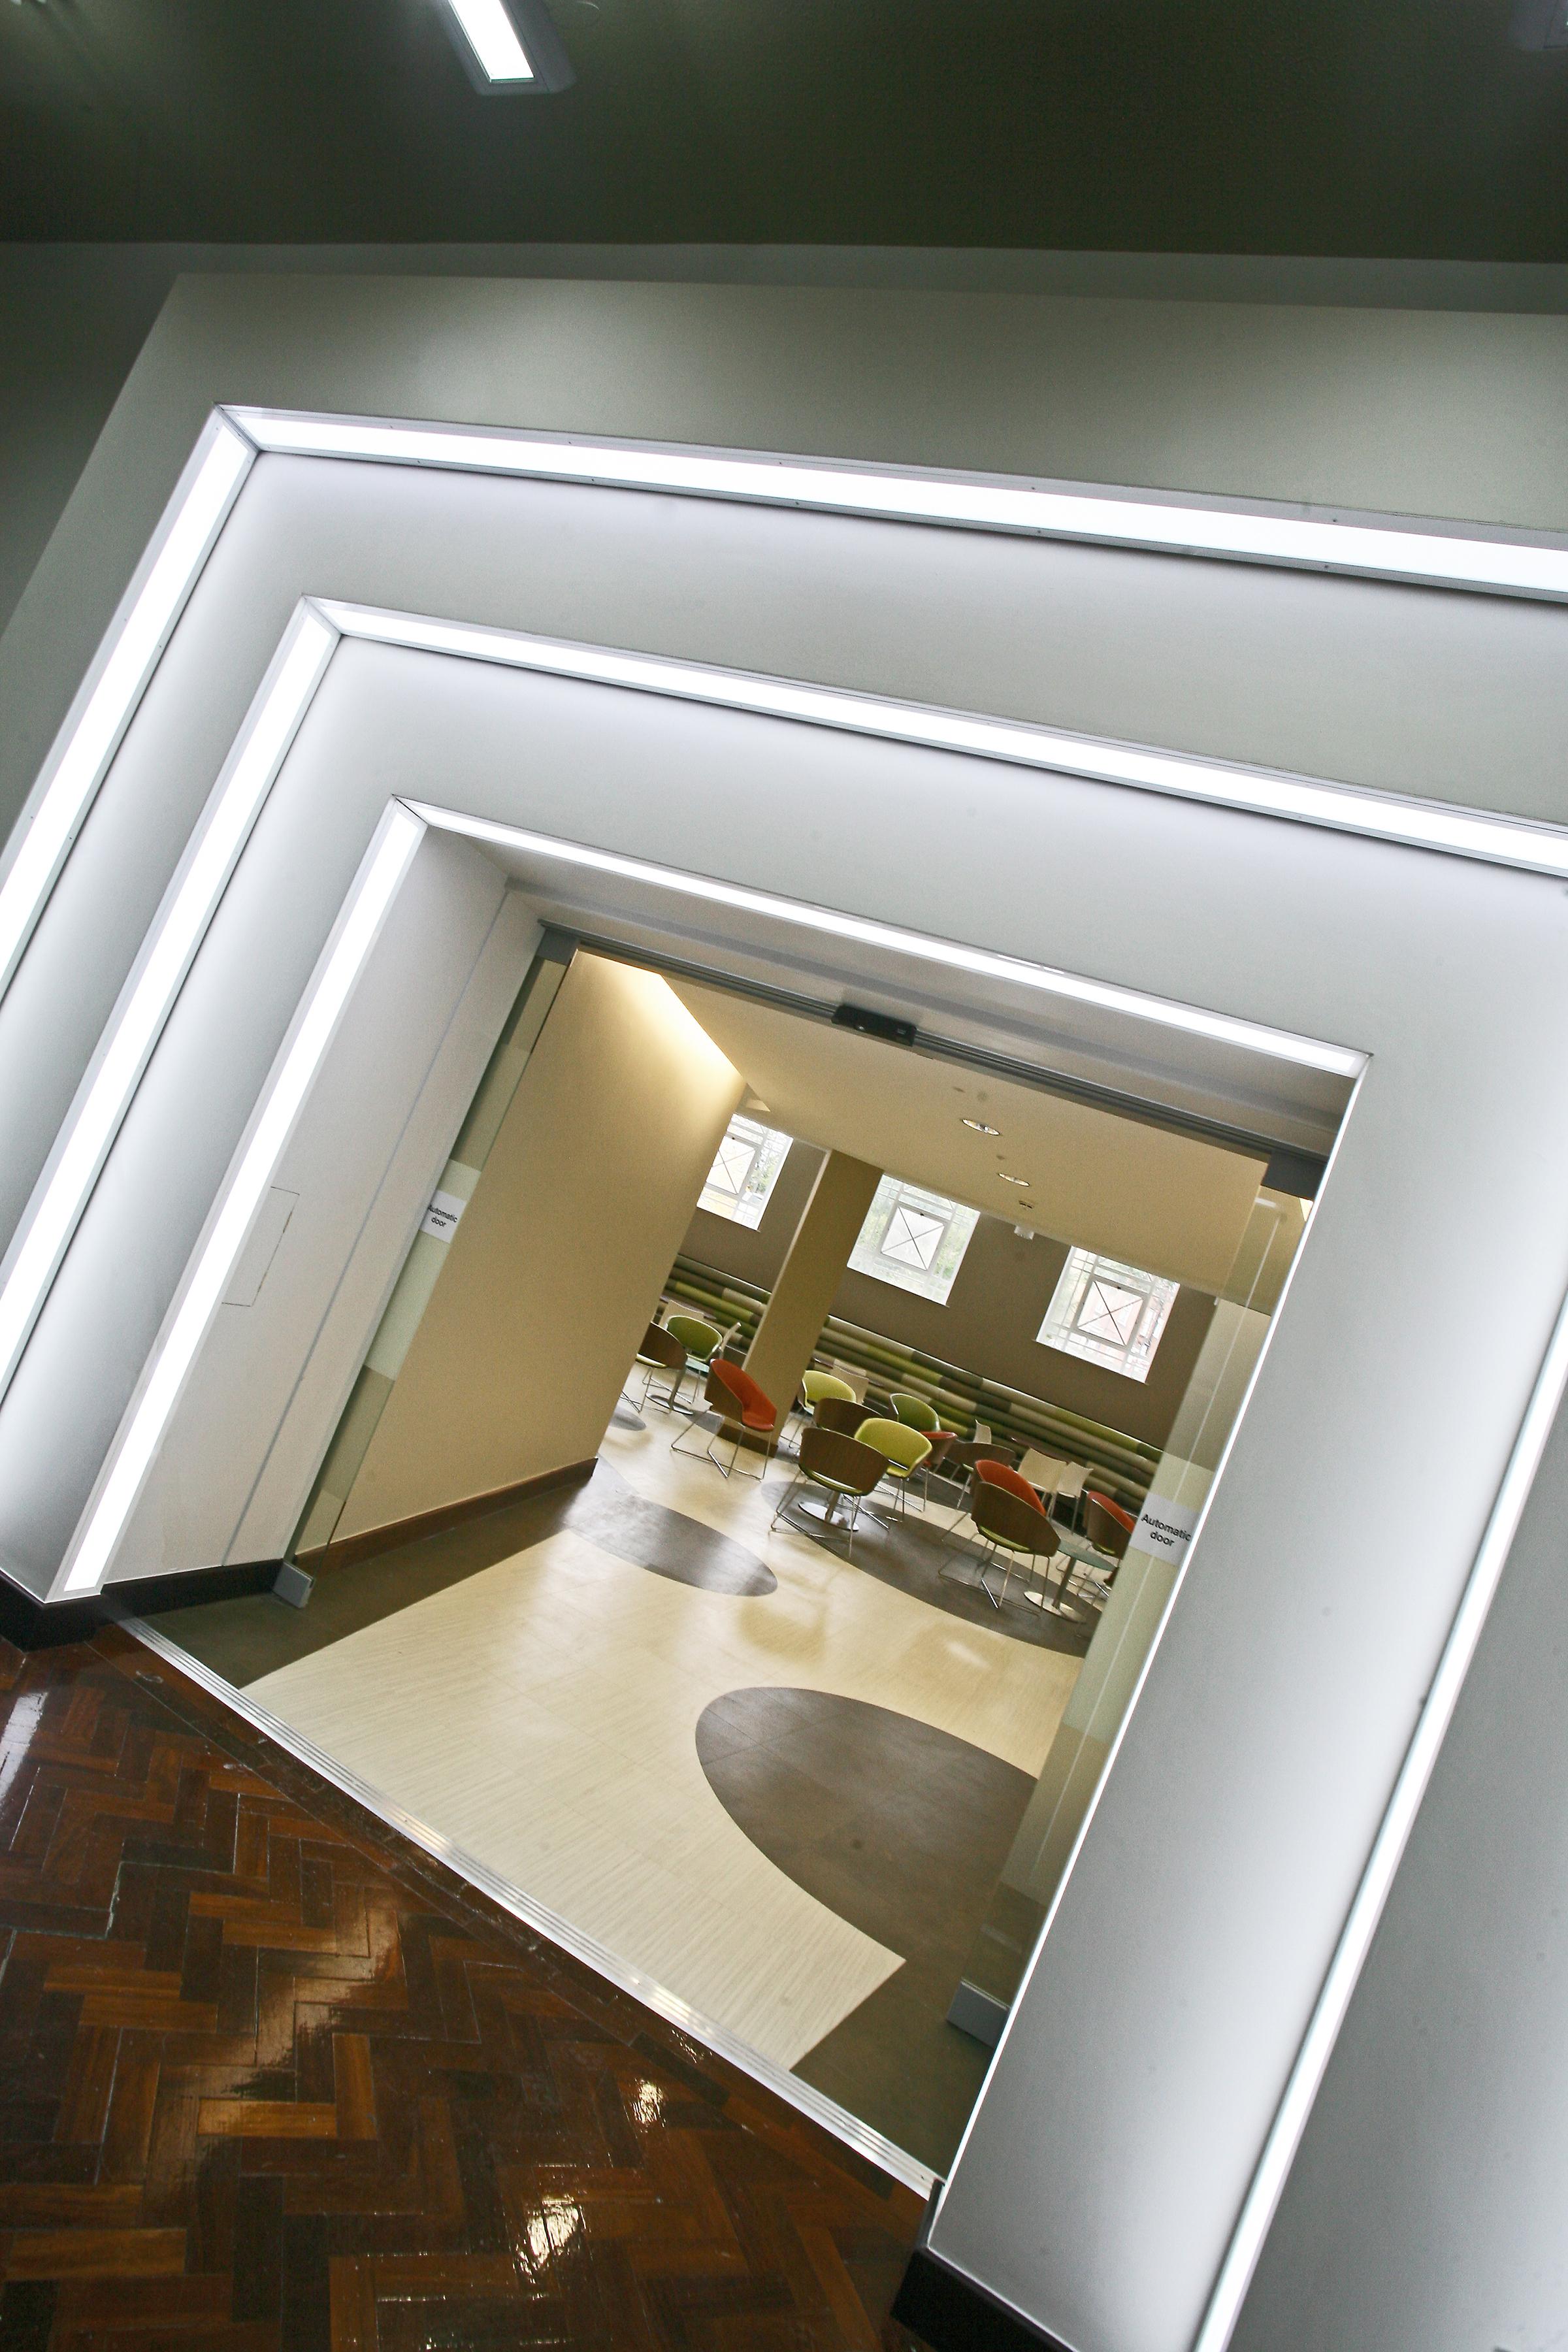 Leeds Cyber cafe 02.jpg